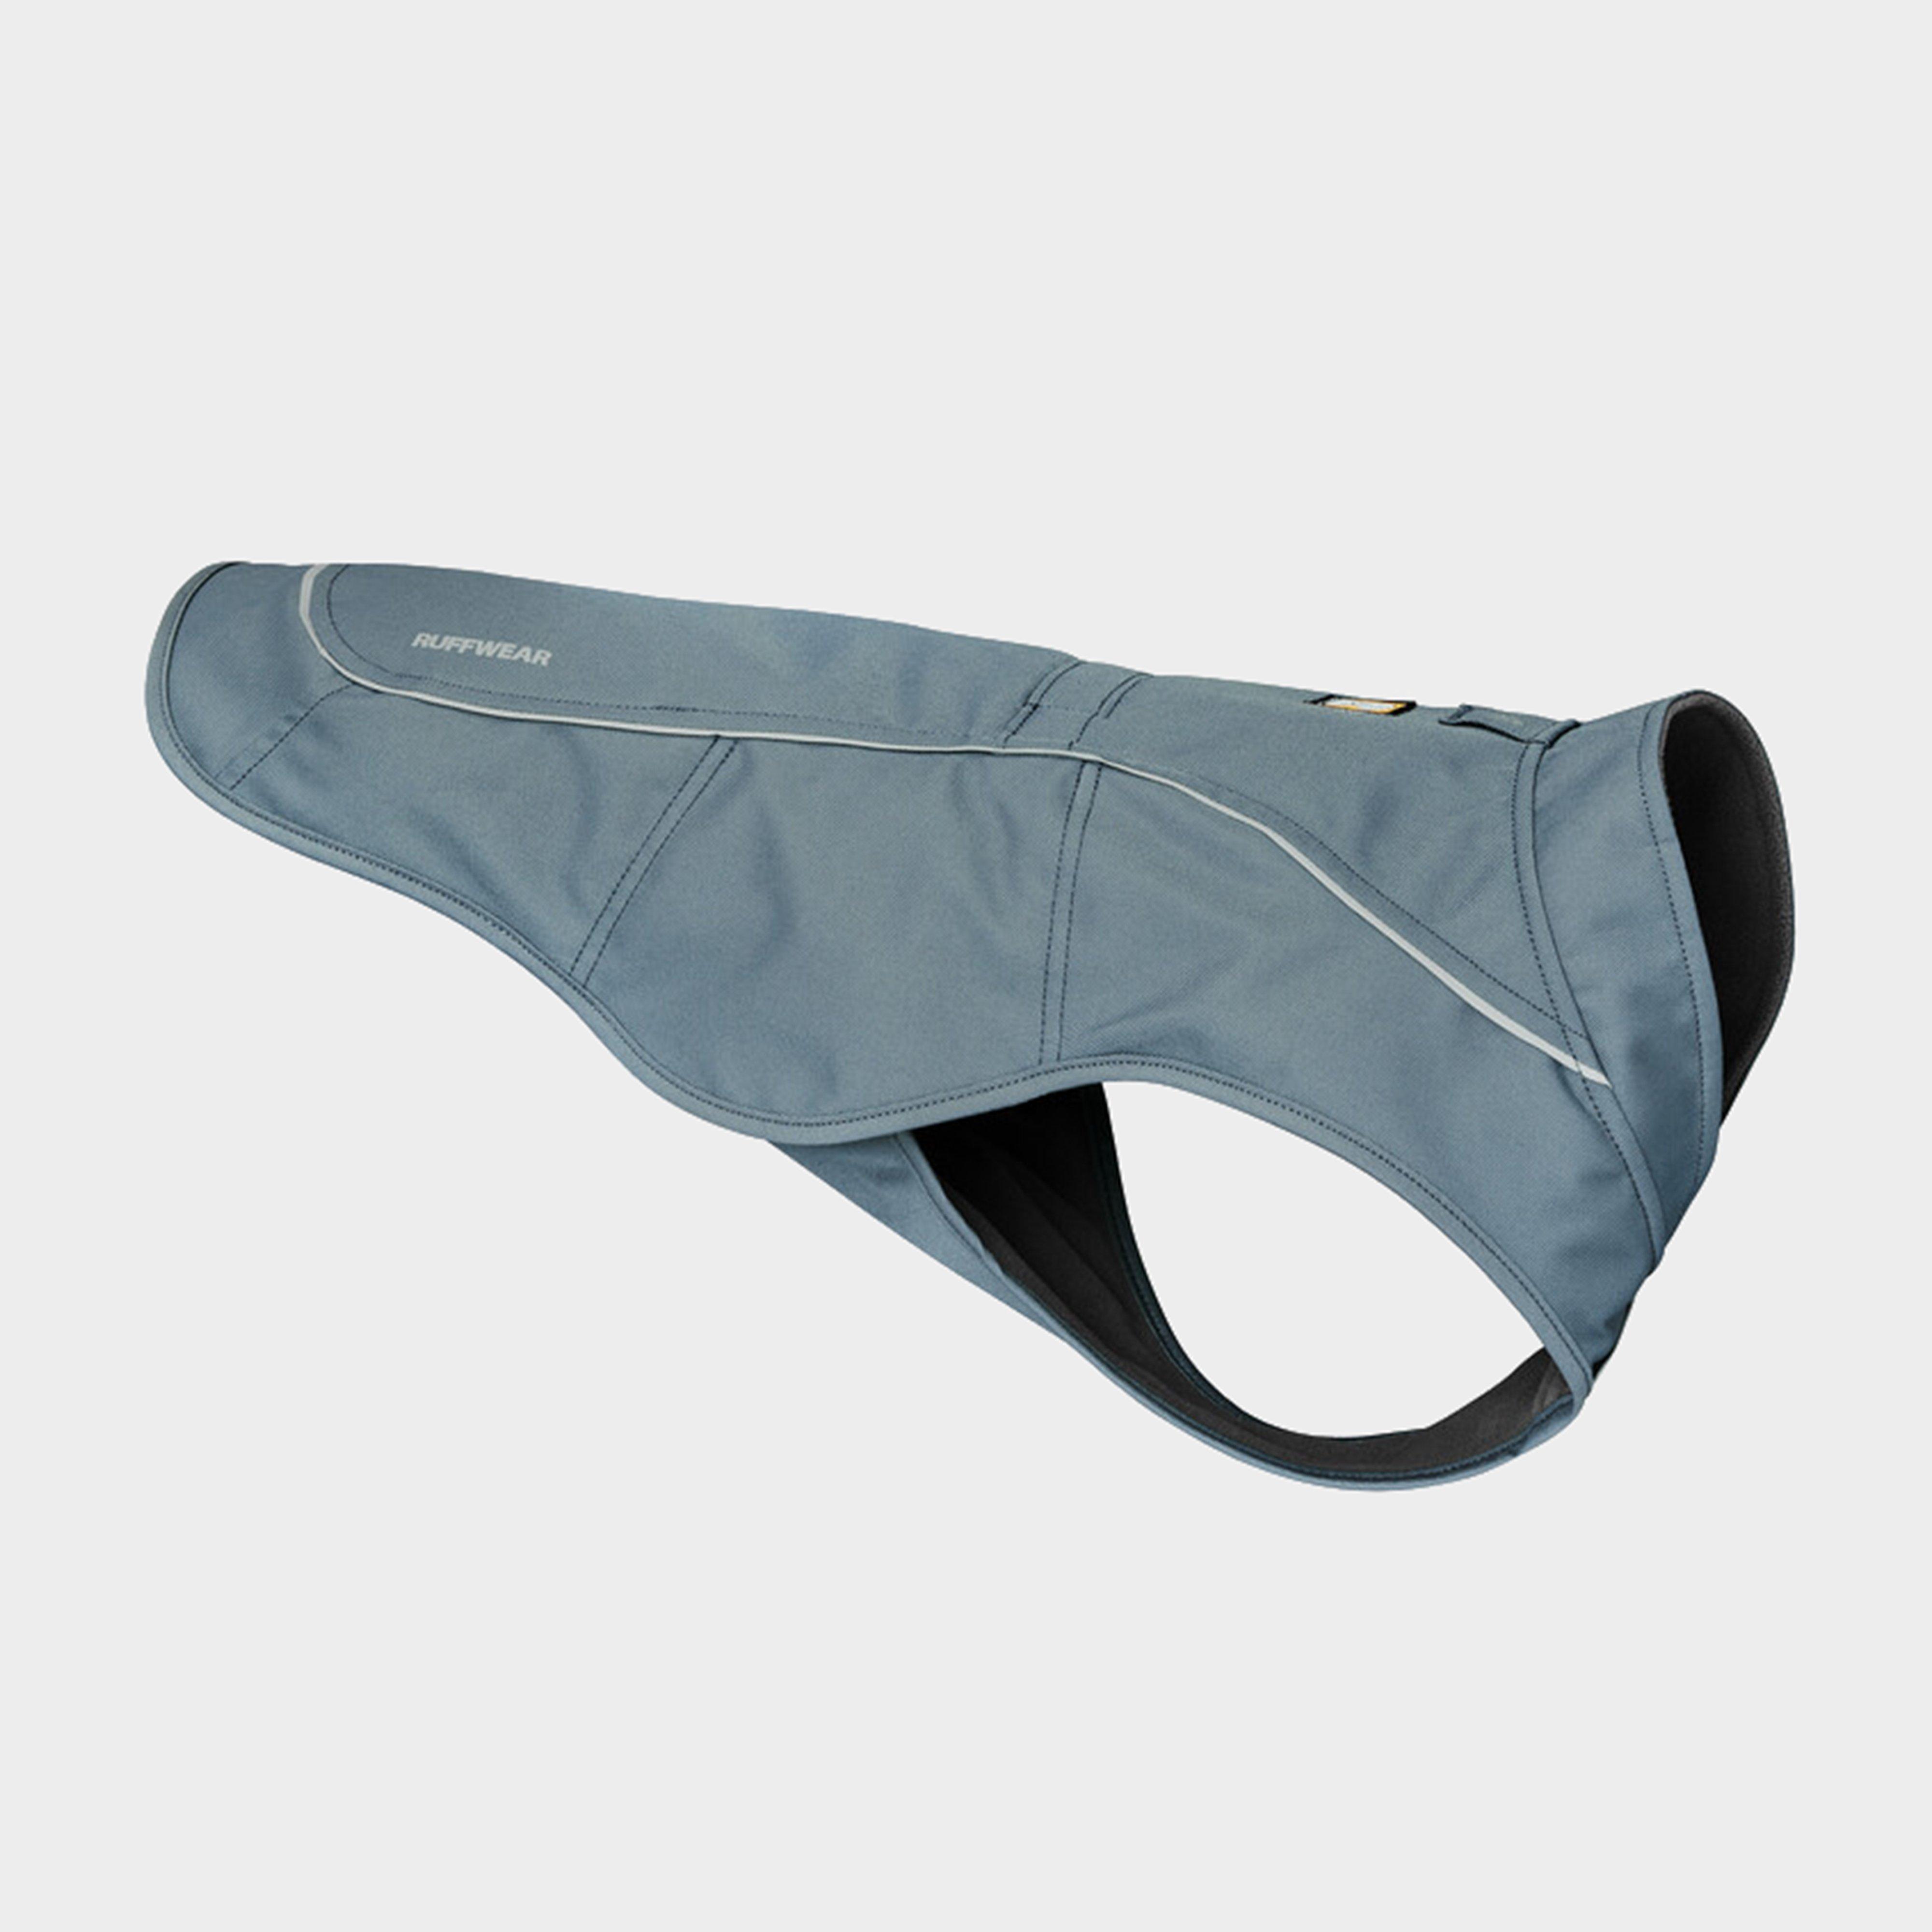 Image of Ruffwear Overcoat Dog Jacket - Blue/Mbl, Blue/MBL